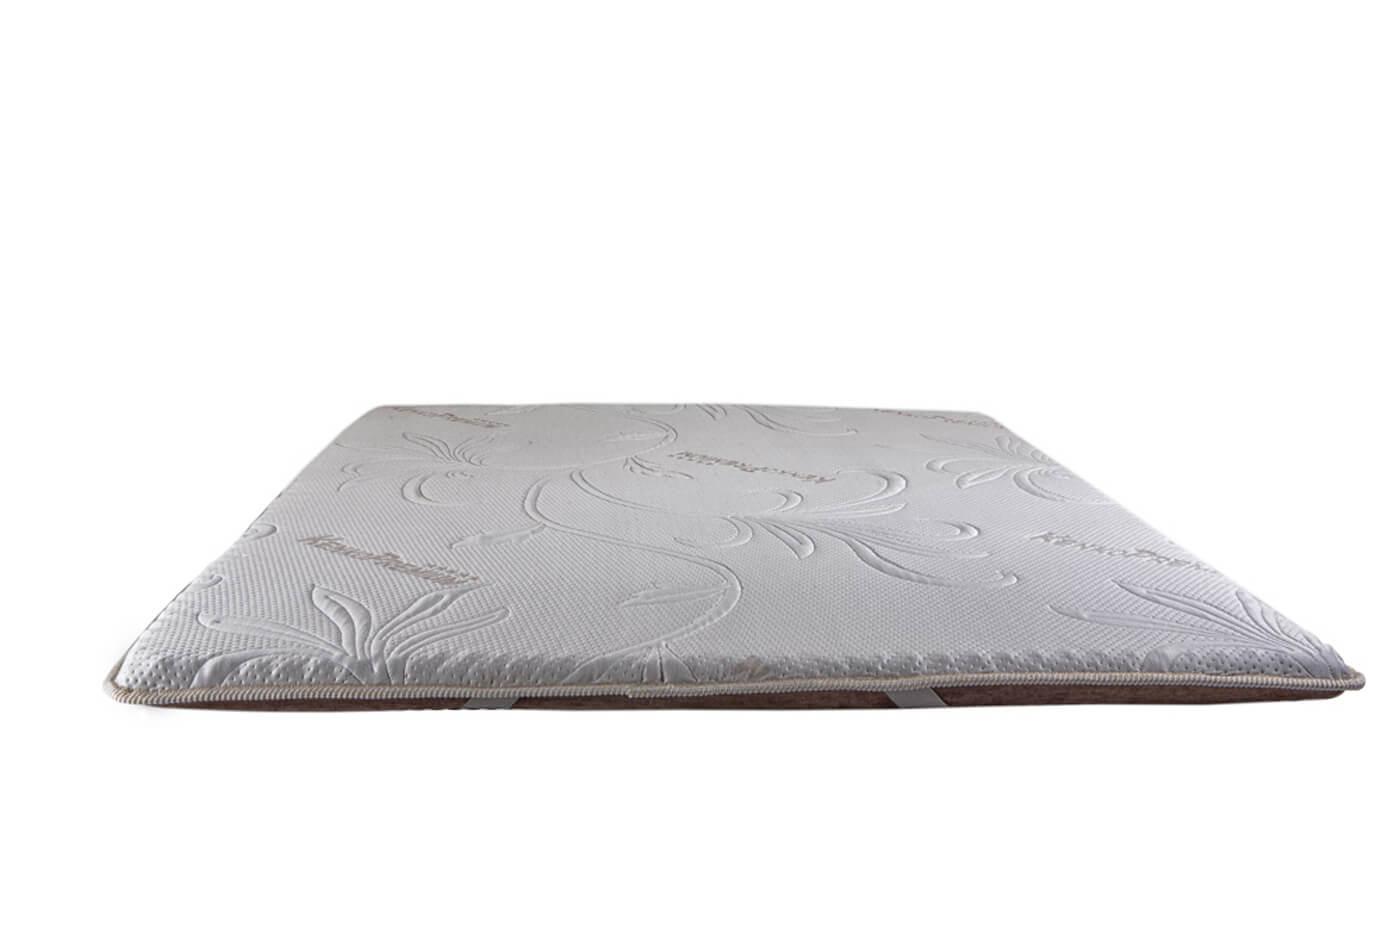 Manta Magnética Colchonete Casal 1,38x1,88x05cm Kenko Premium   - Kenko Premium Colchões